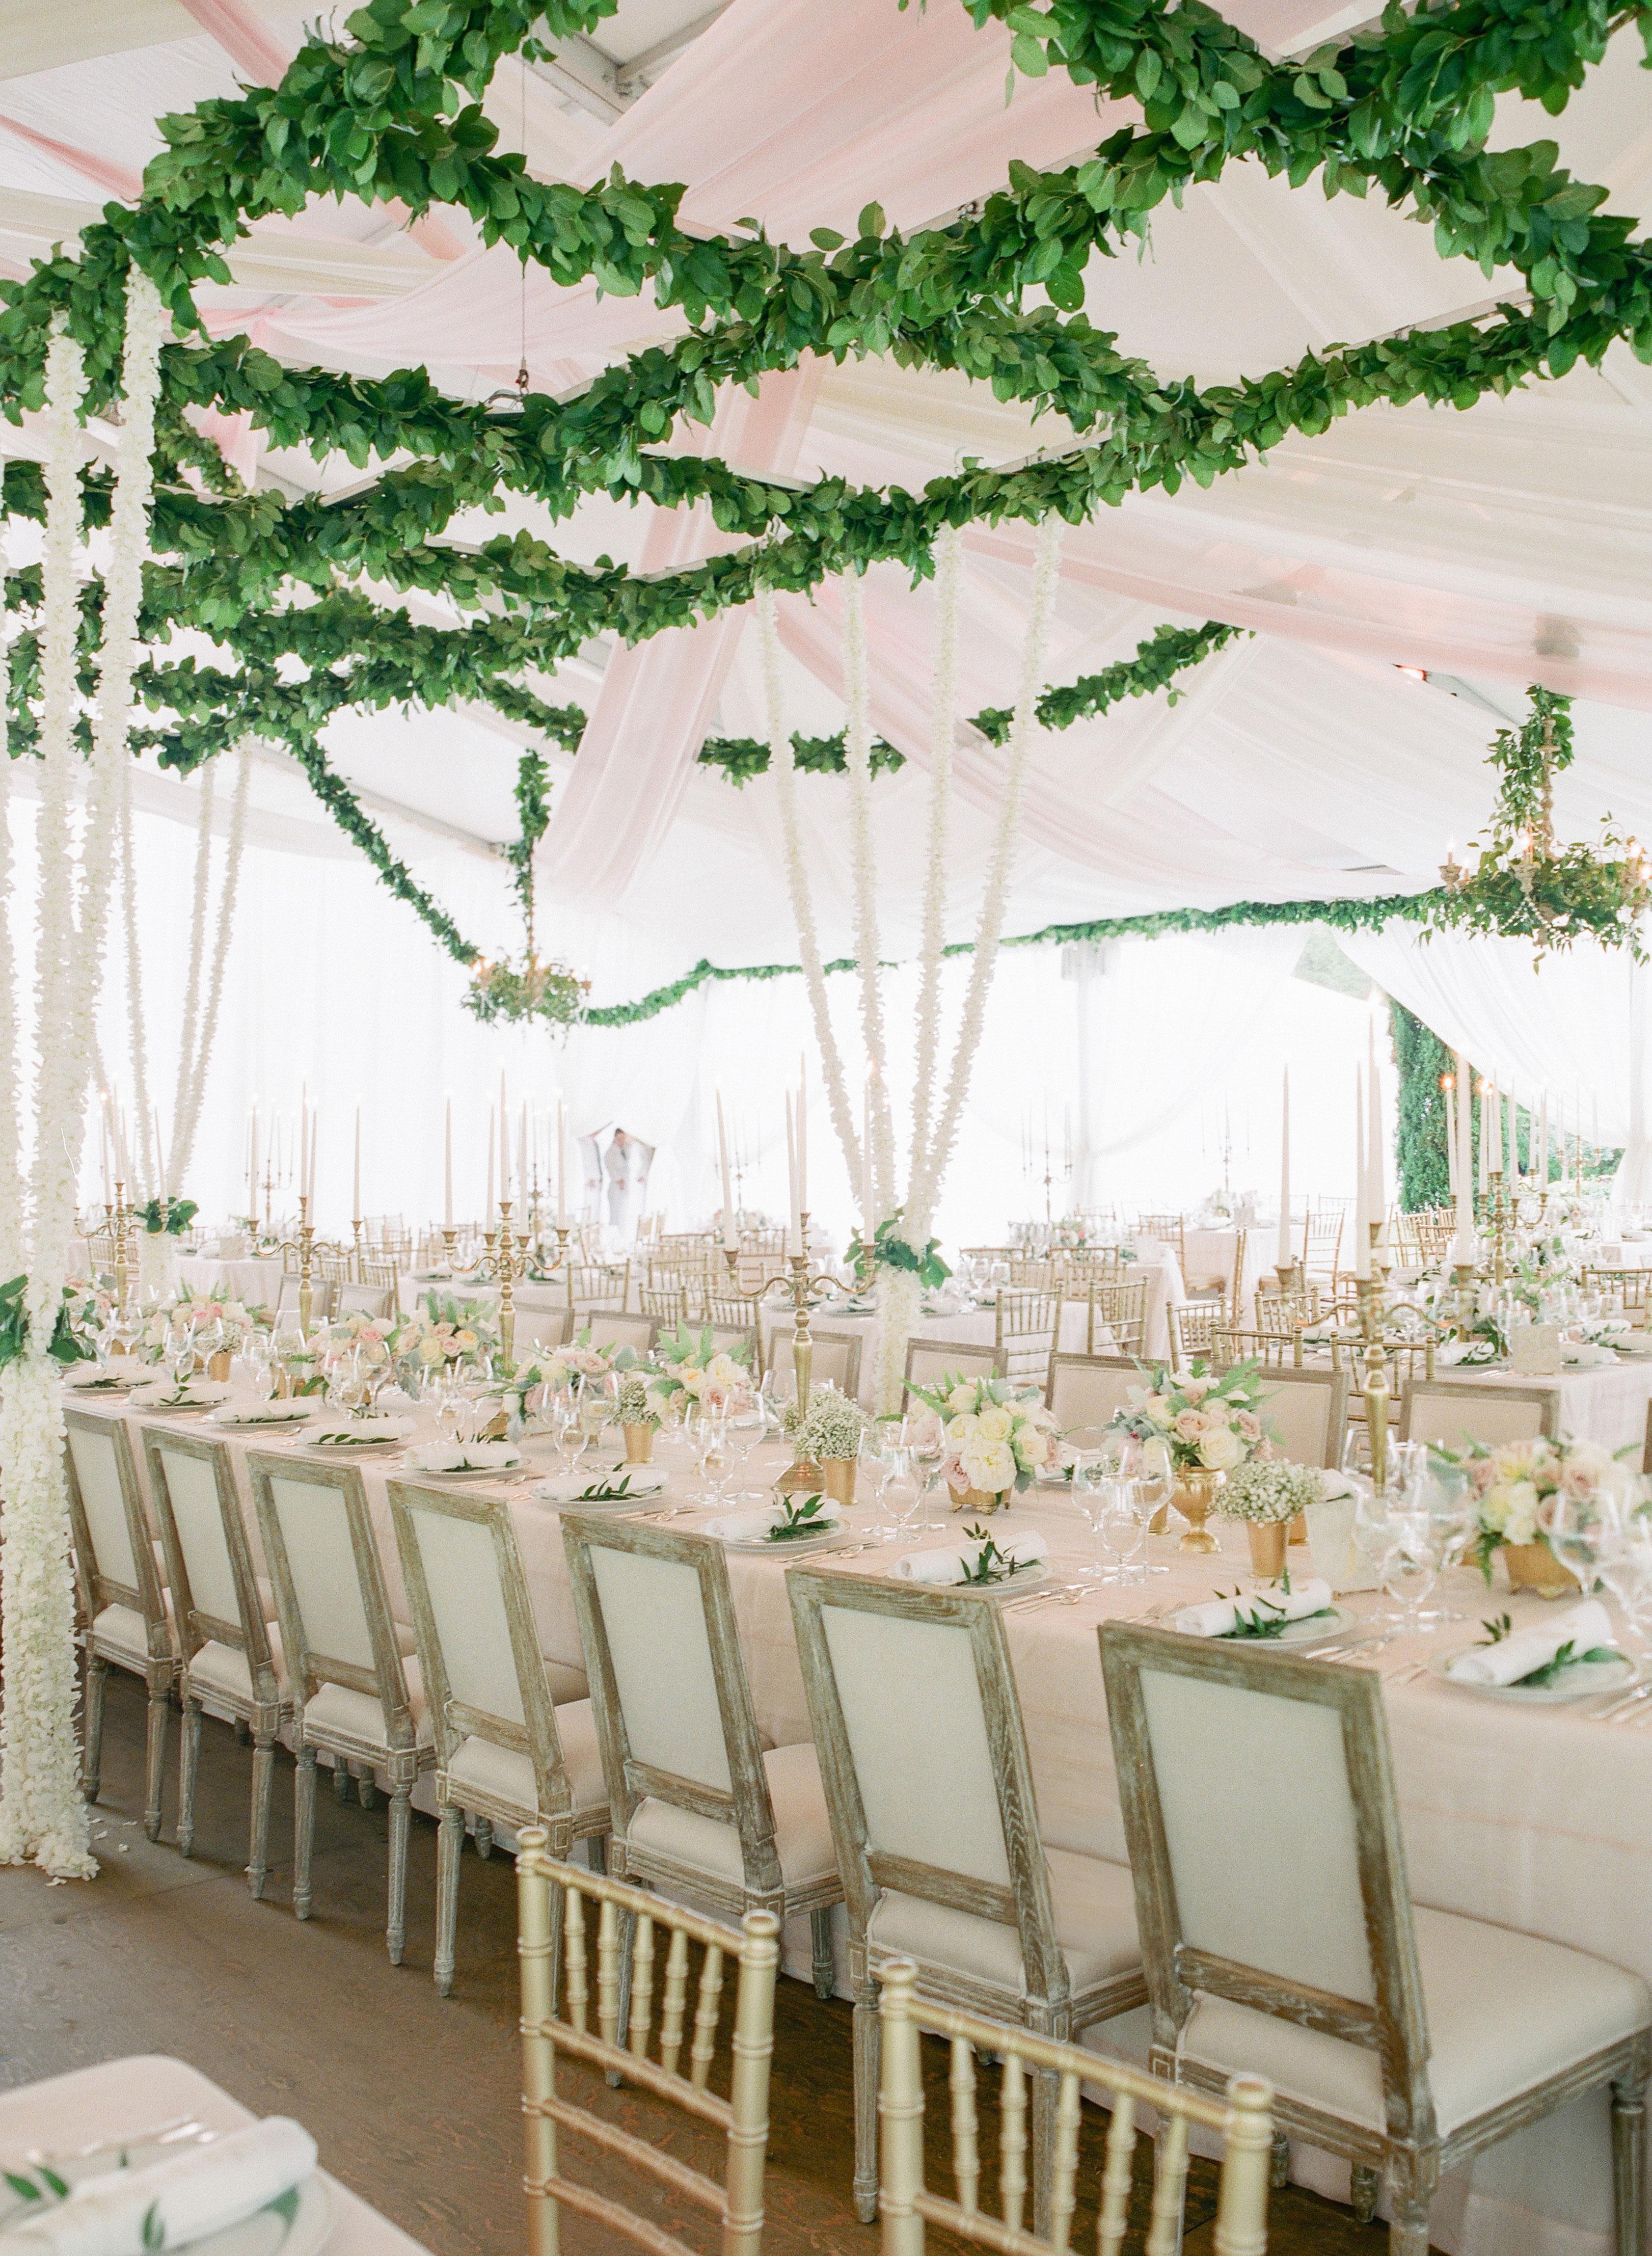 Brooke and David's wedding - tent installation